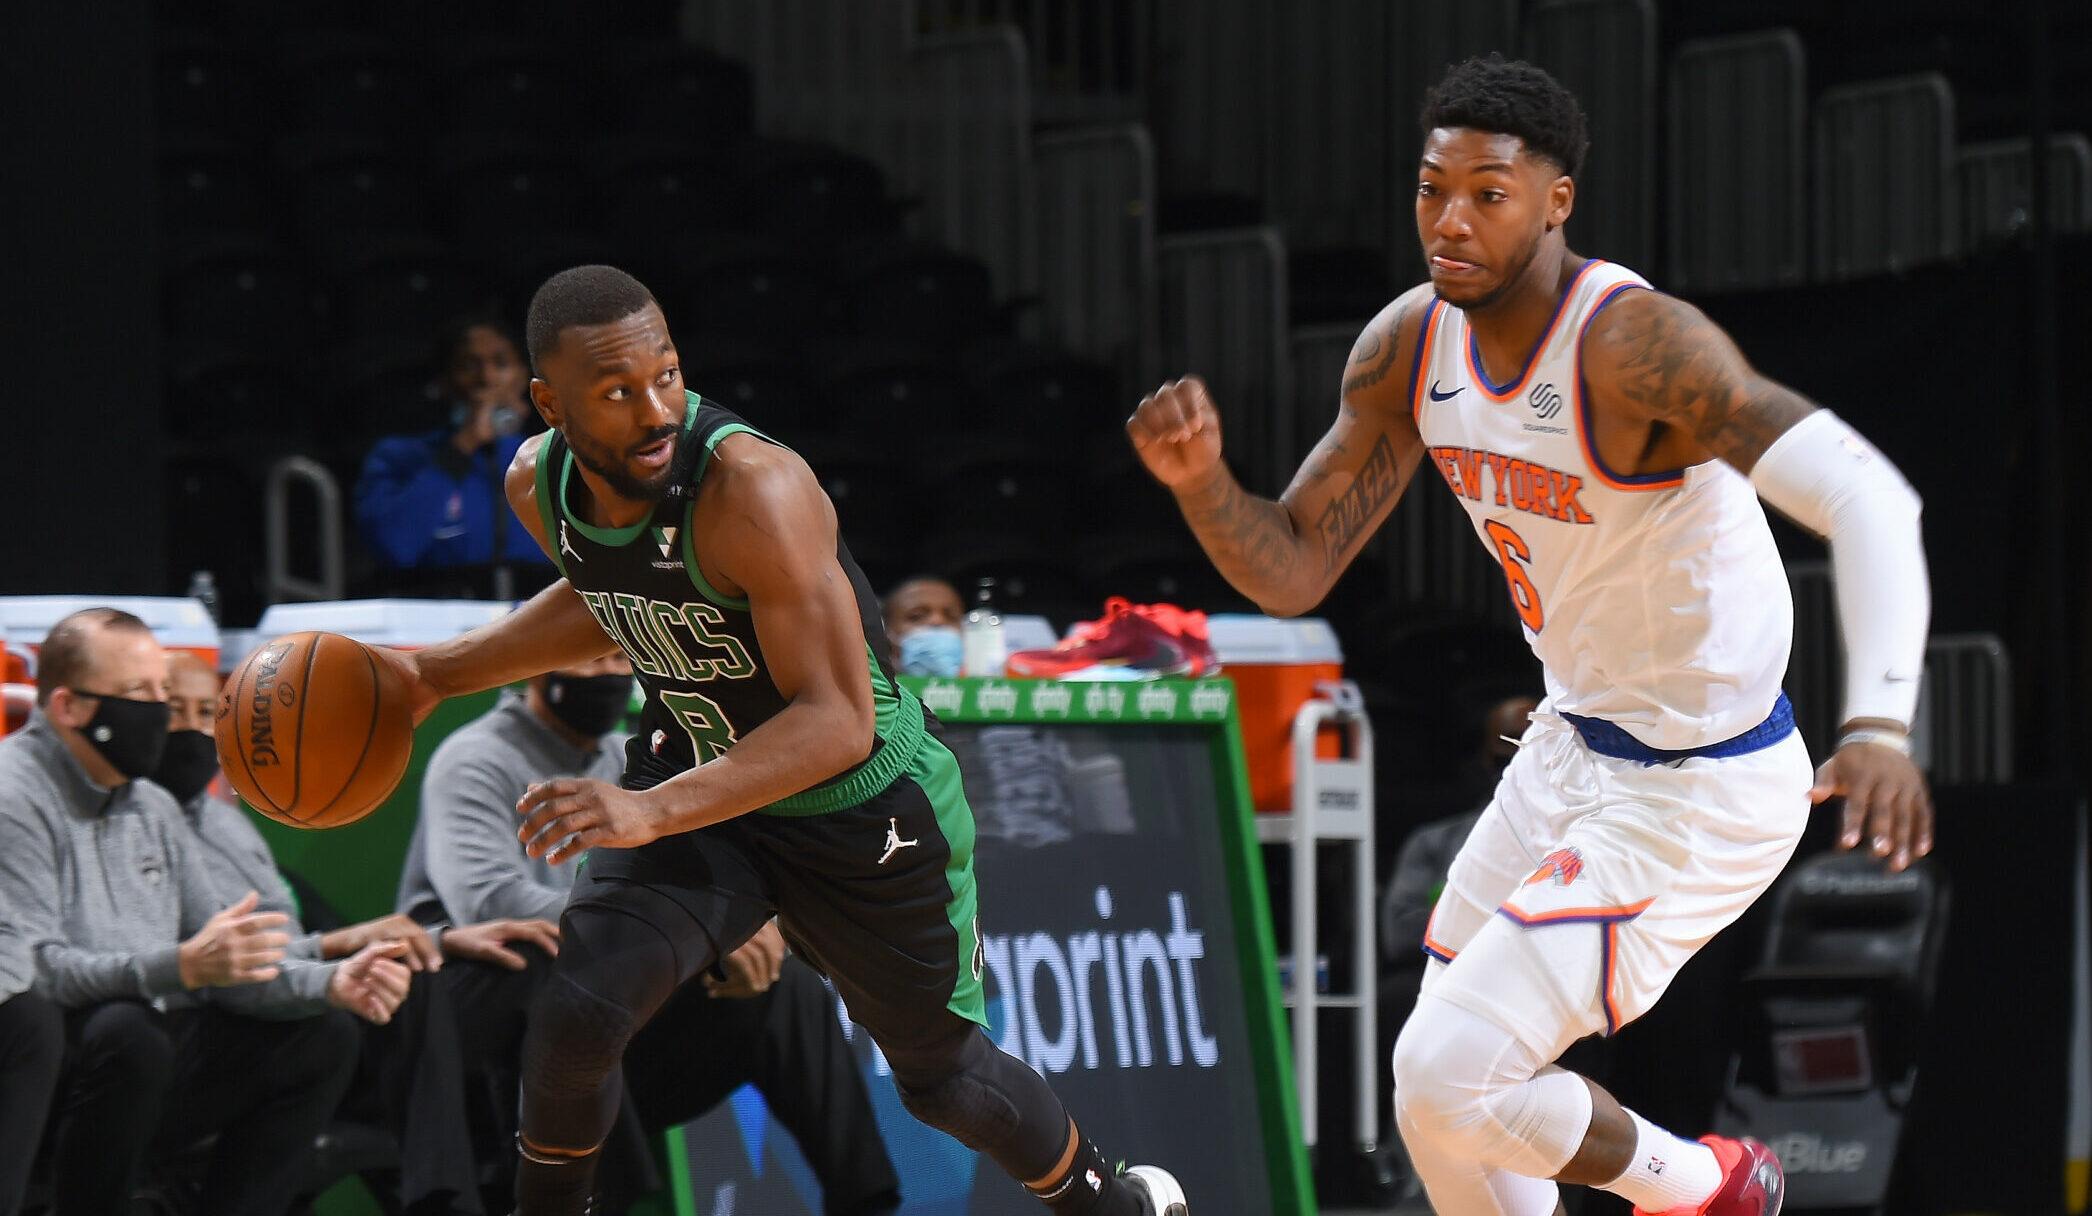 Kemba Walker plays against Knicks in blowout loss